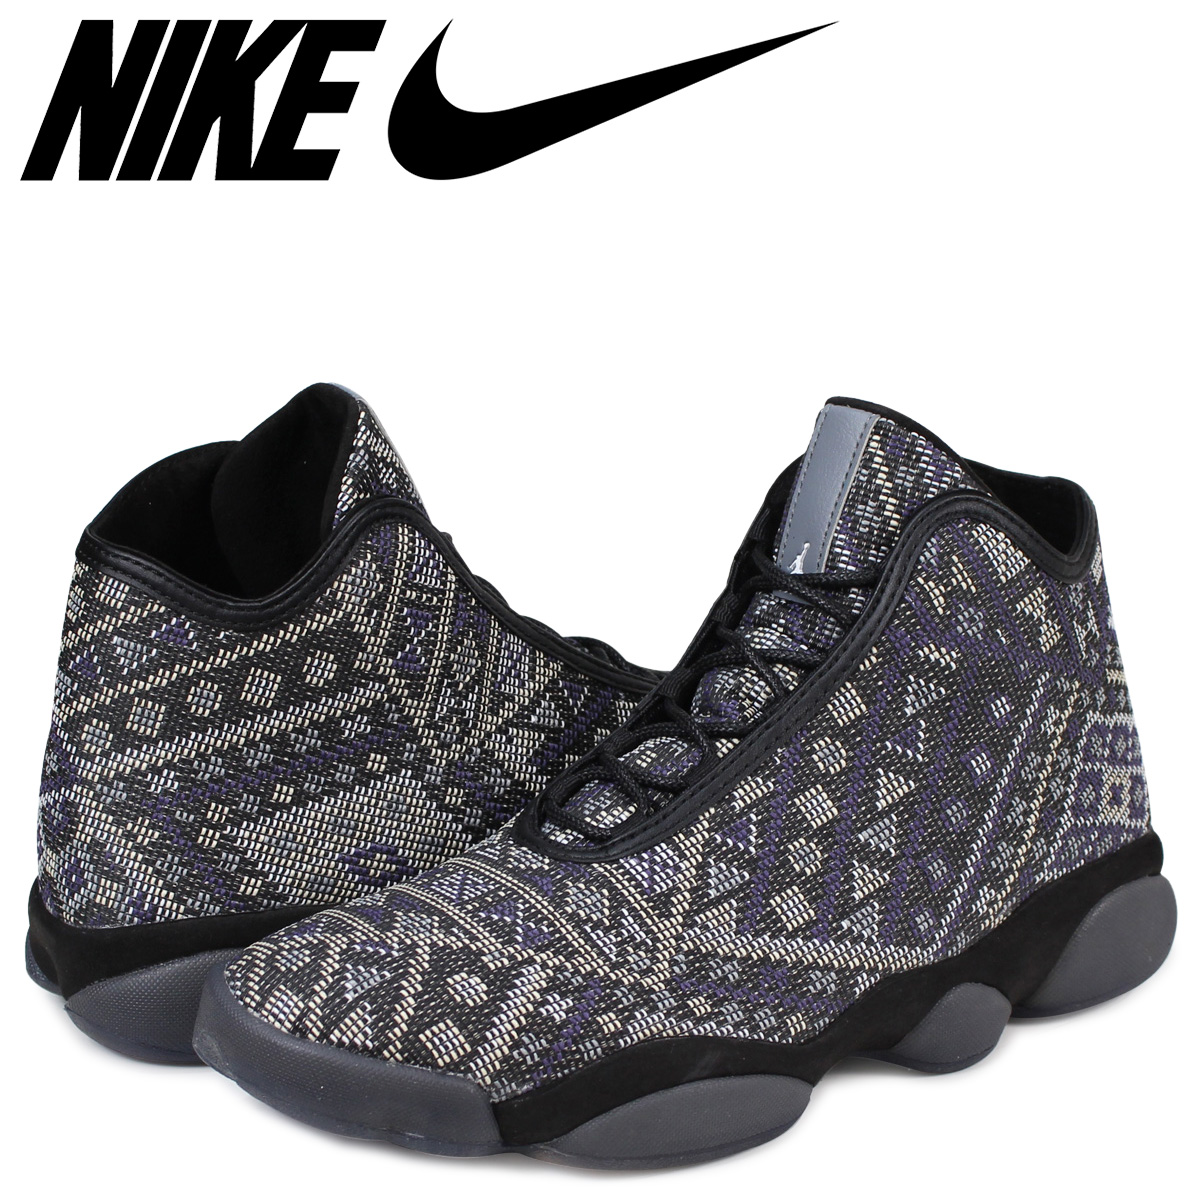 new arrival ab2c3 dac58 cheap nike jordan horizon premium black history month bhm nike jordan  horizon sneakers 822333 022 mens